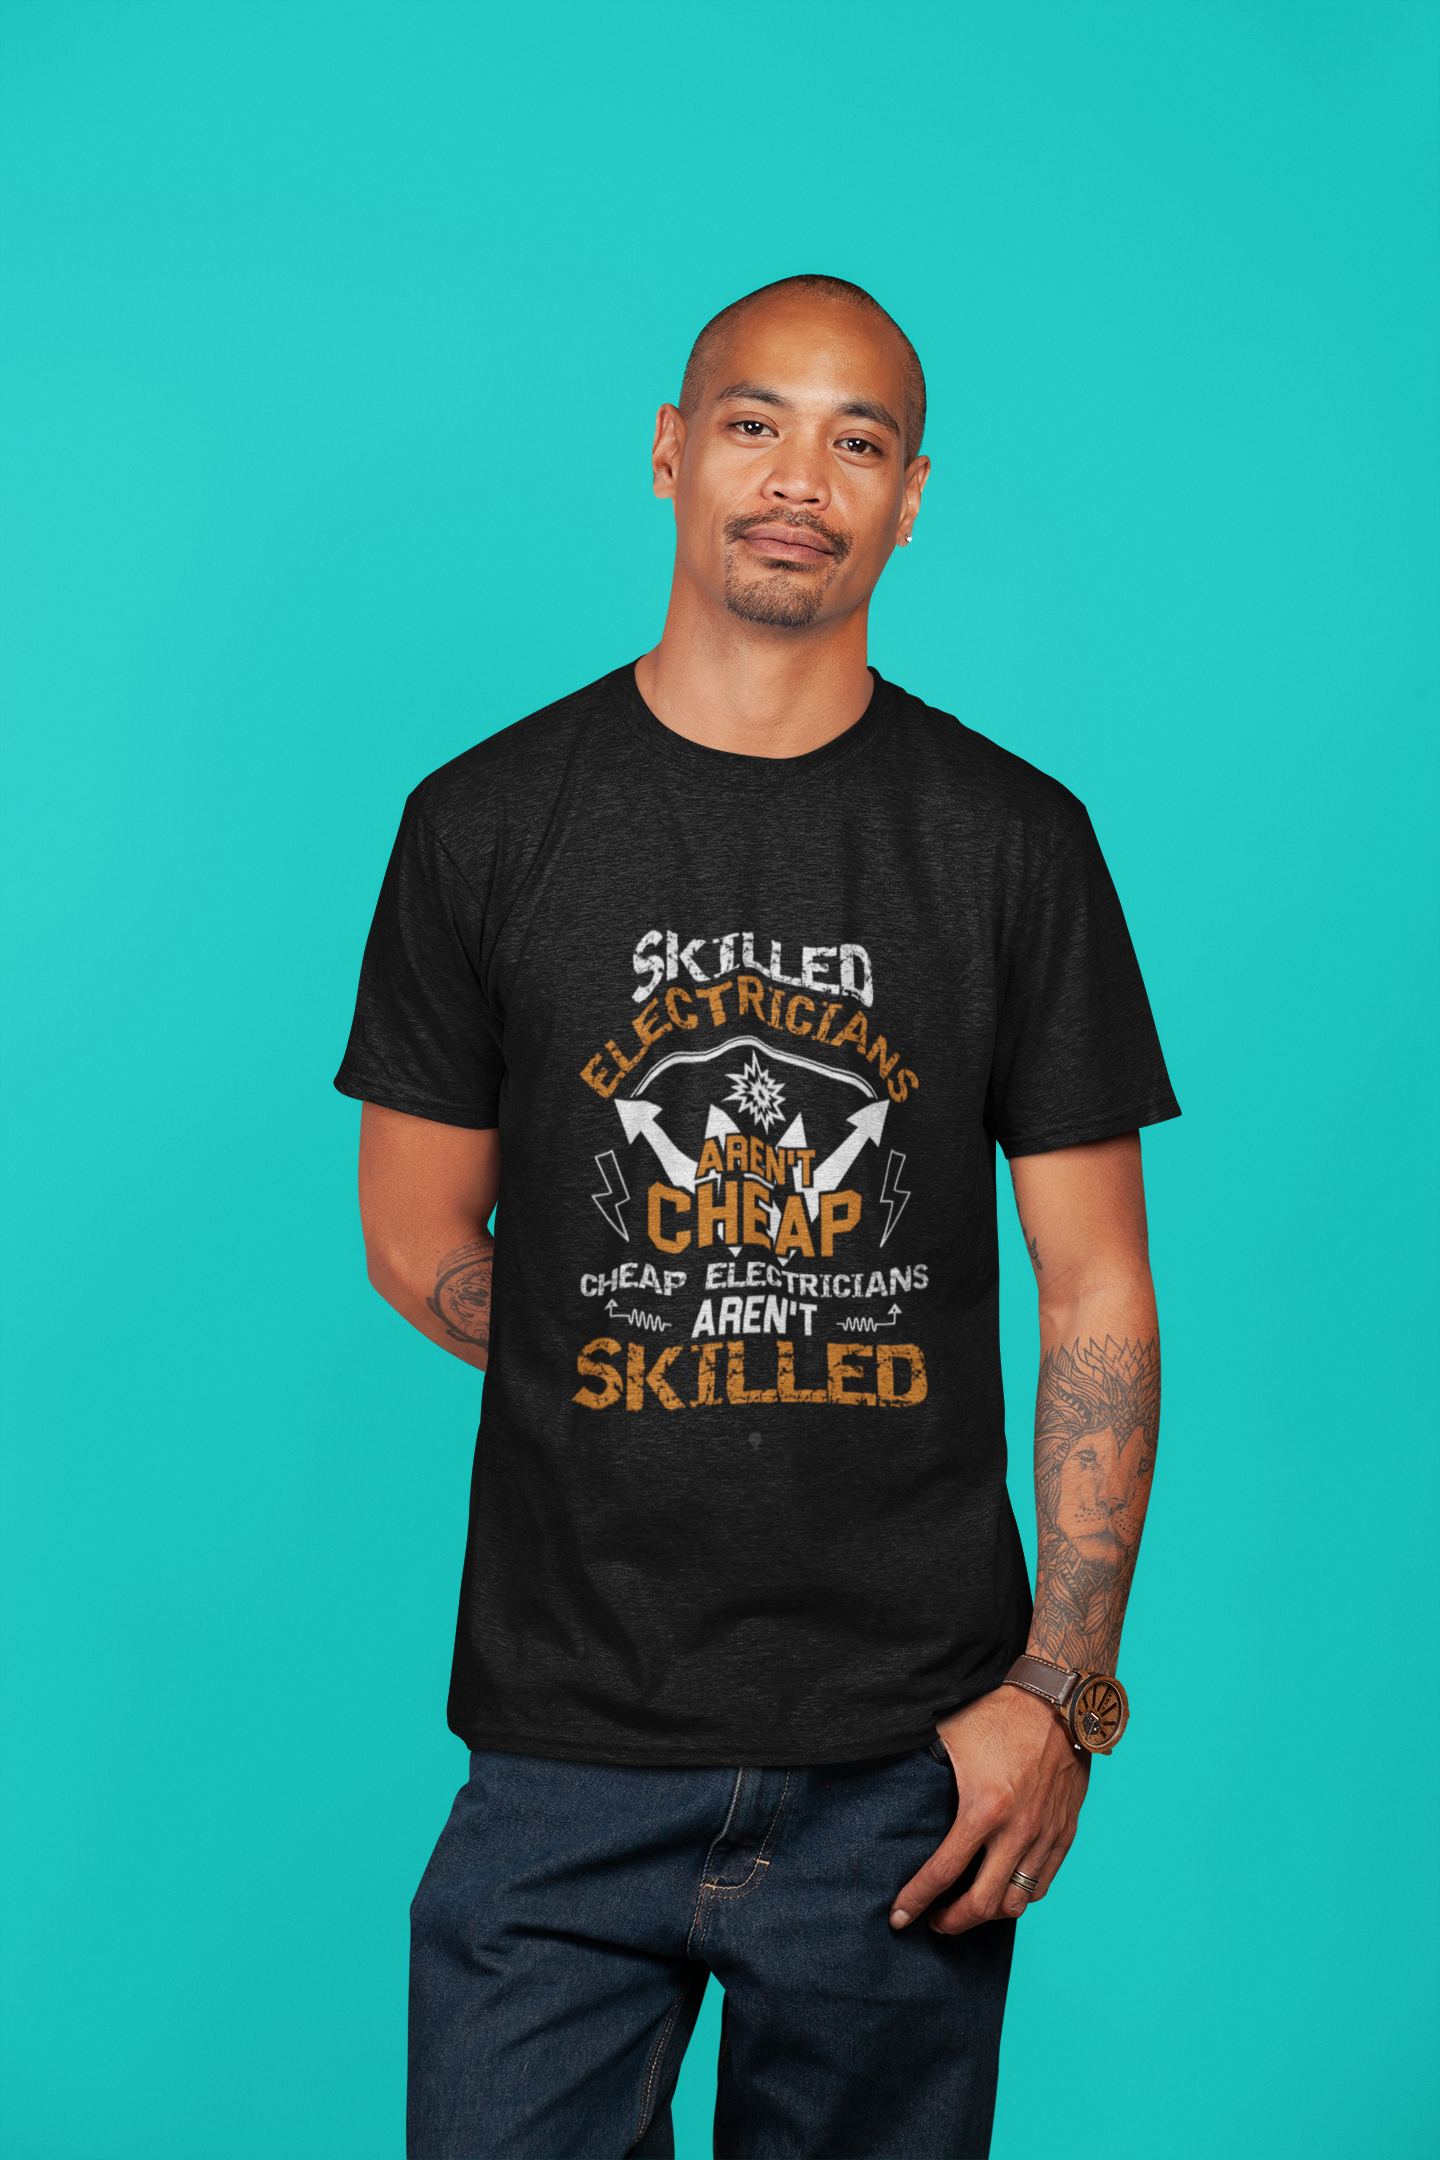 t-shirt-mockup-of-a-tattooed-man-at-a-studio-23944.png